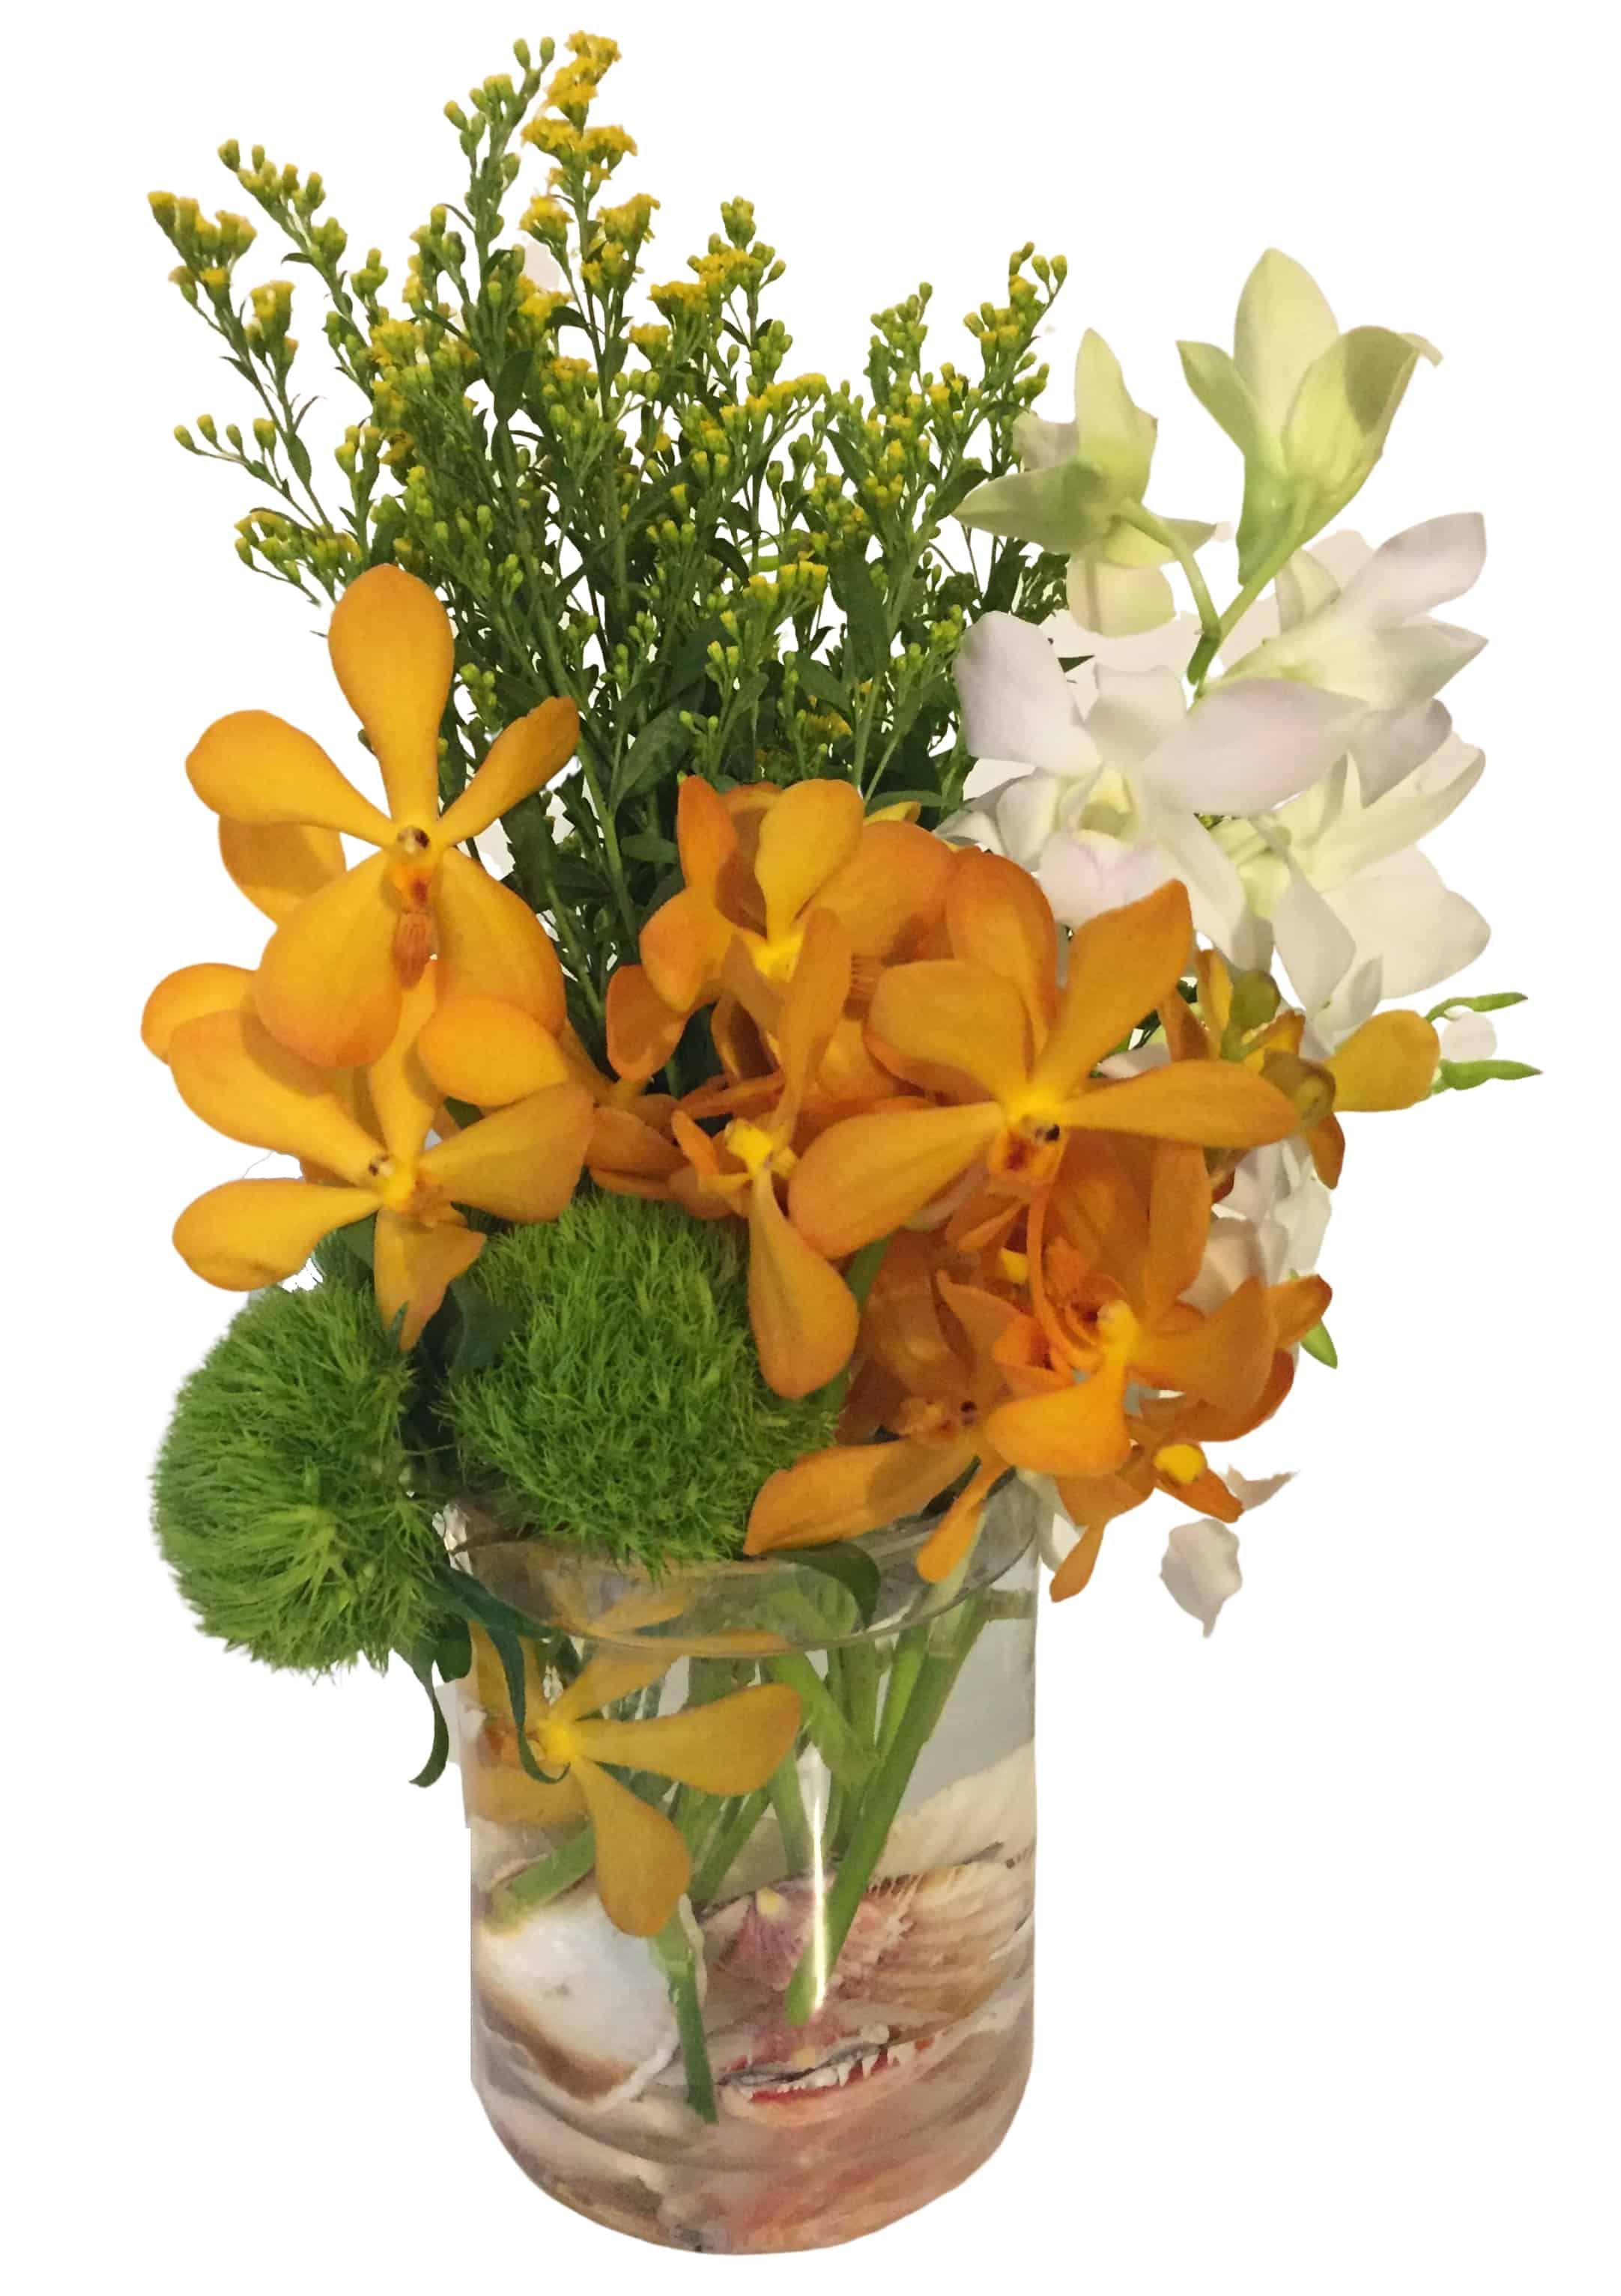 Orchid Shore Flower Arrangement | San Francisco Florist Since 1871 Free Bay Area and San Francisco Flower Delivery